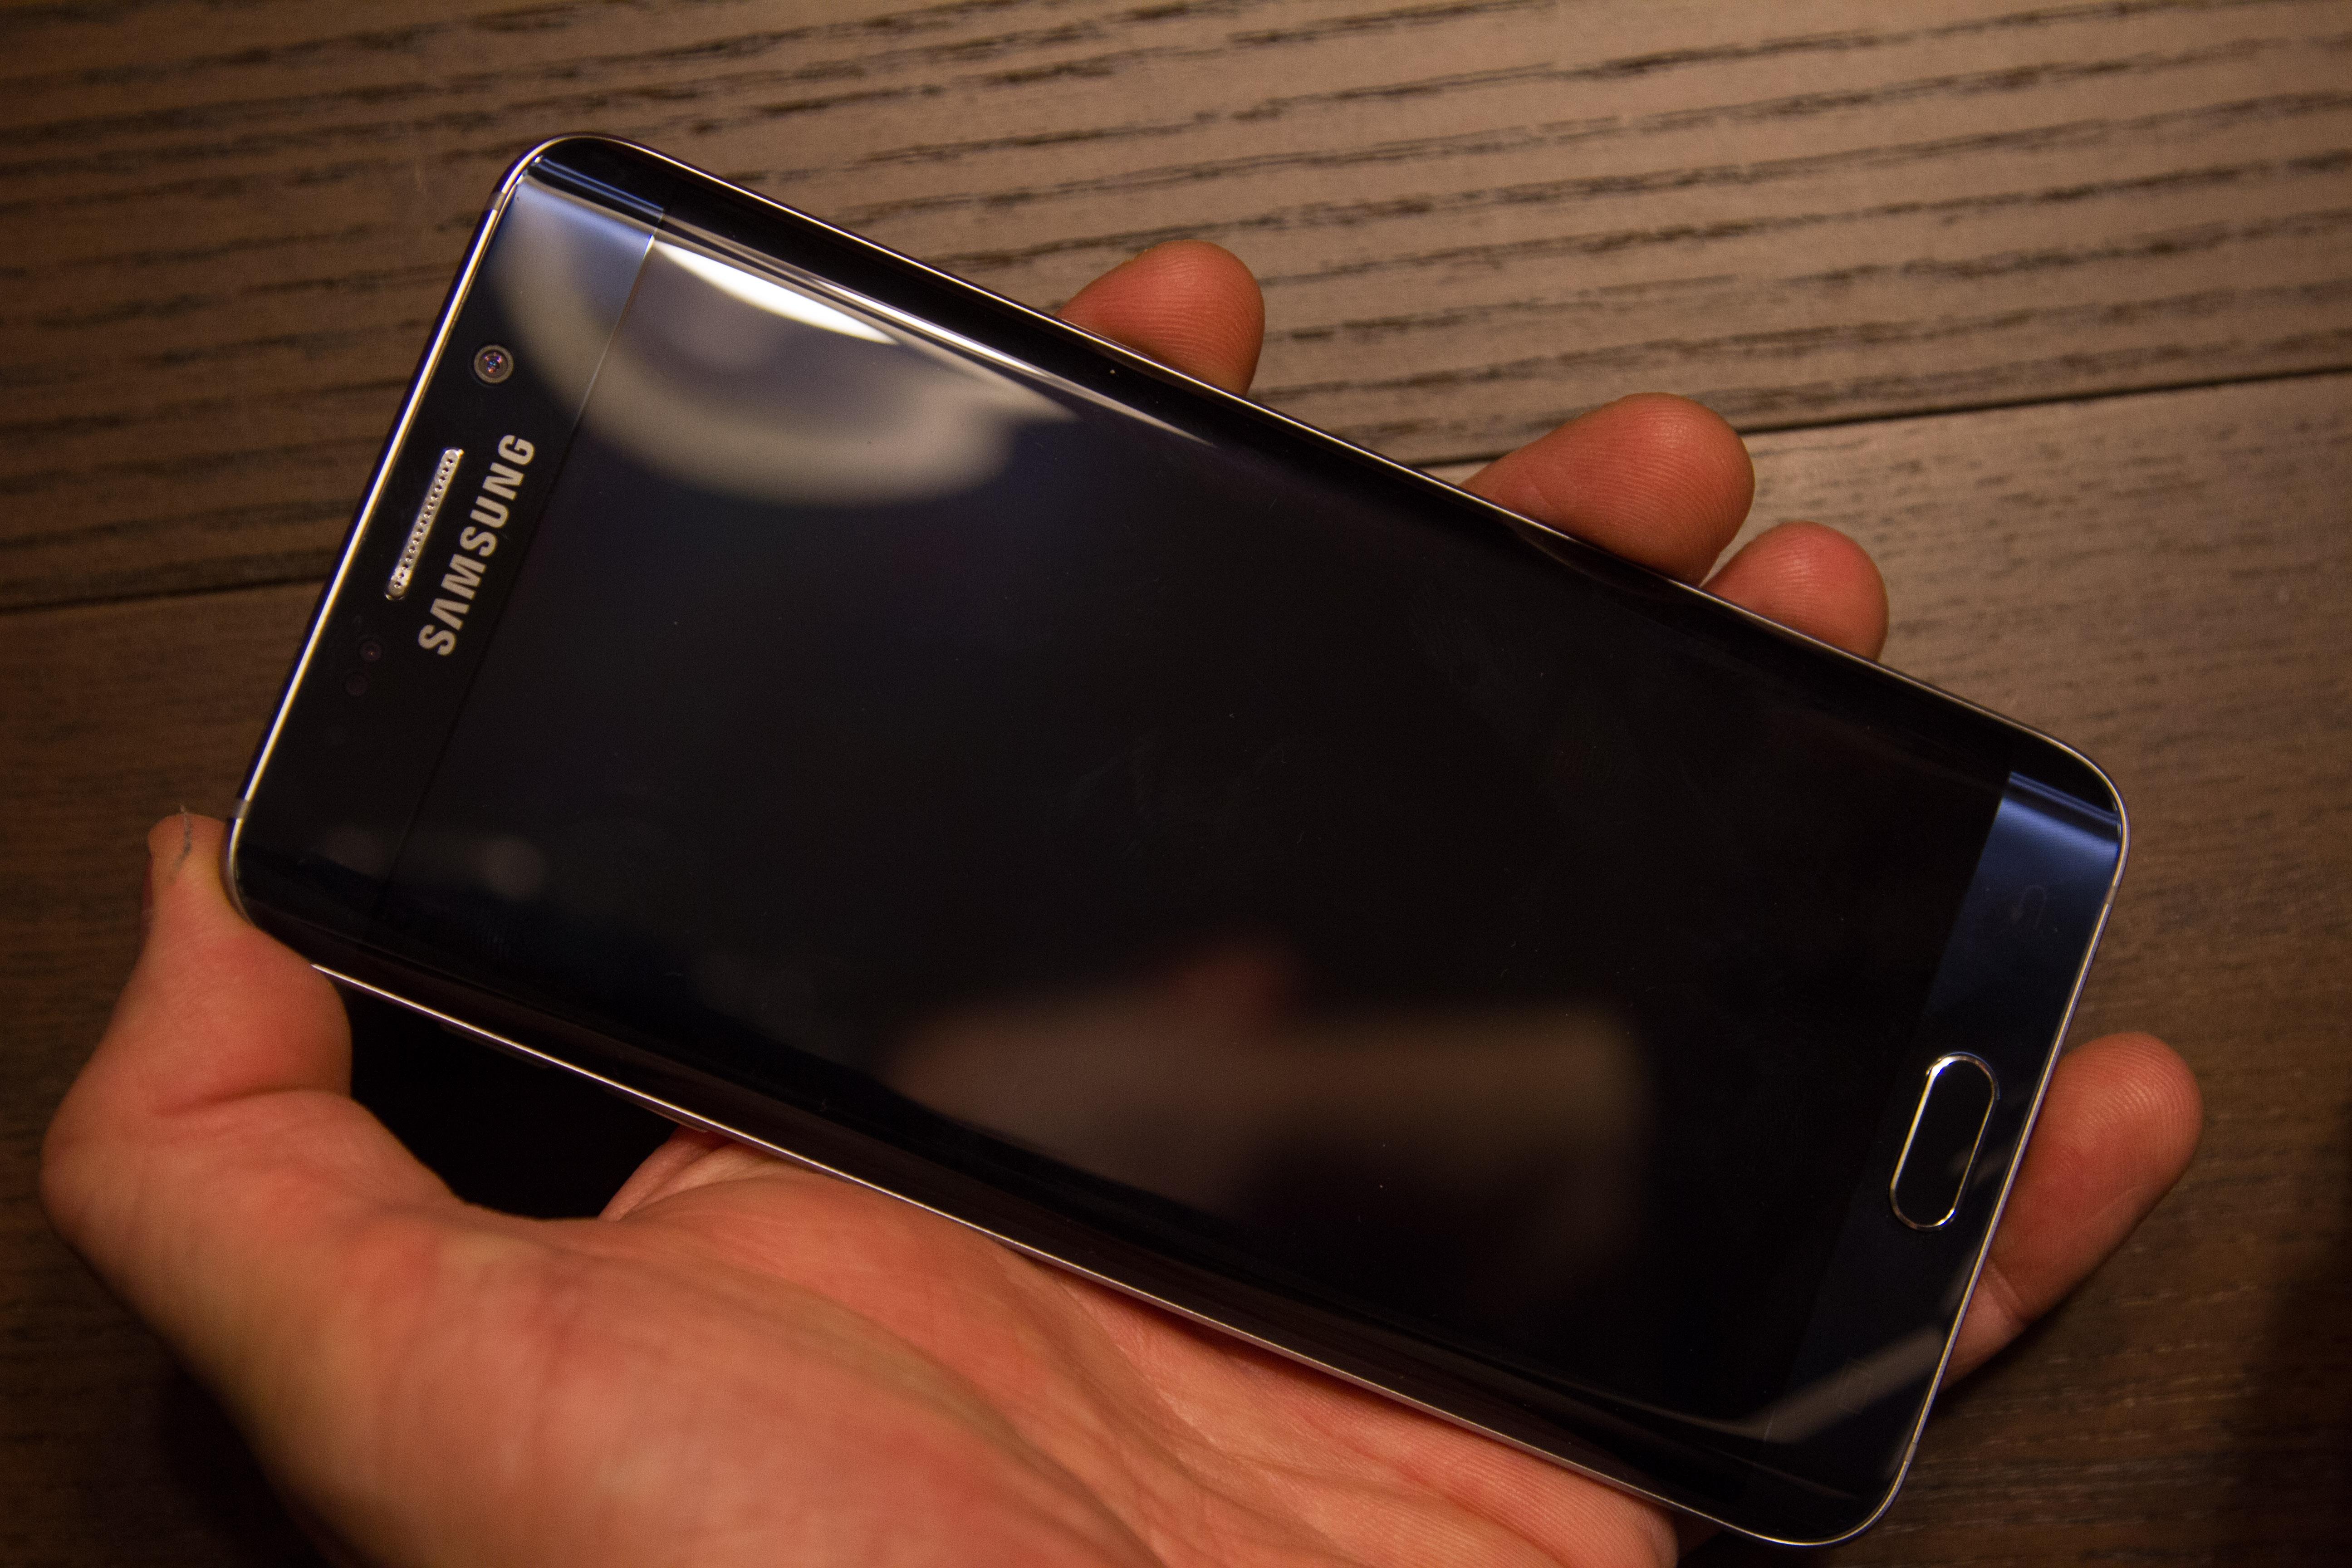 SamsungEdge+-4